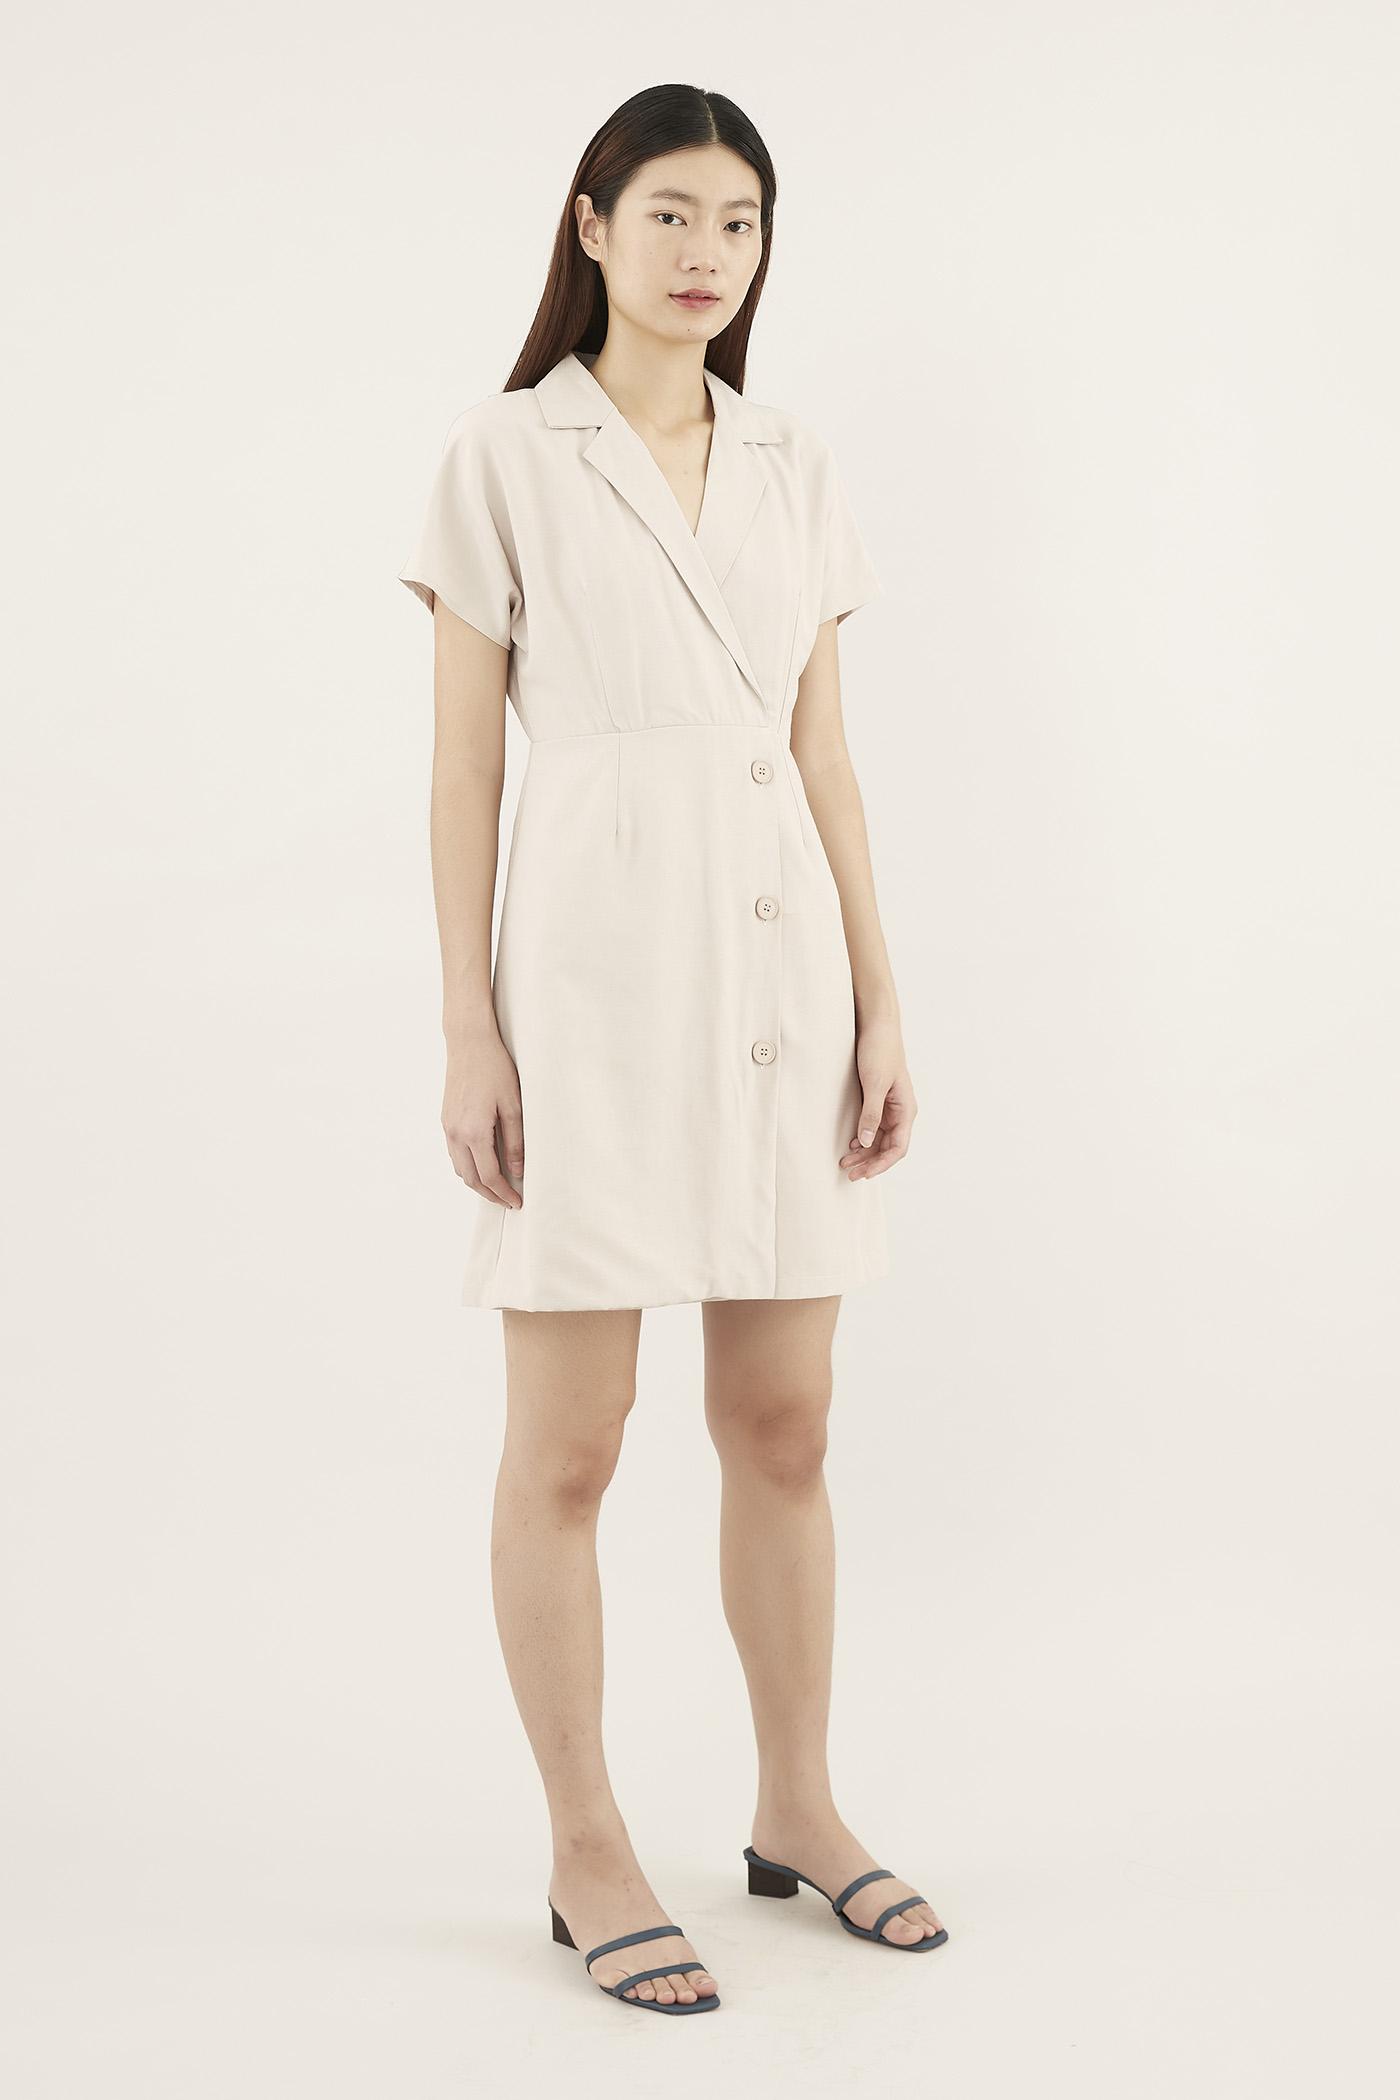 Jalene Collared Dress